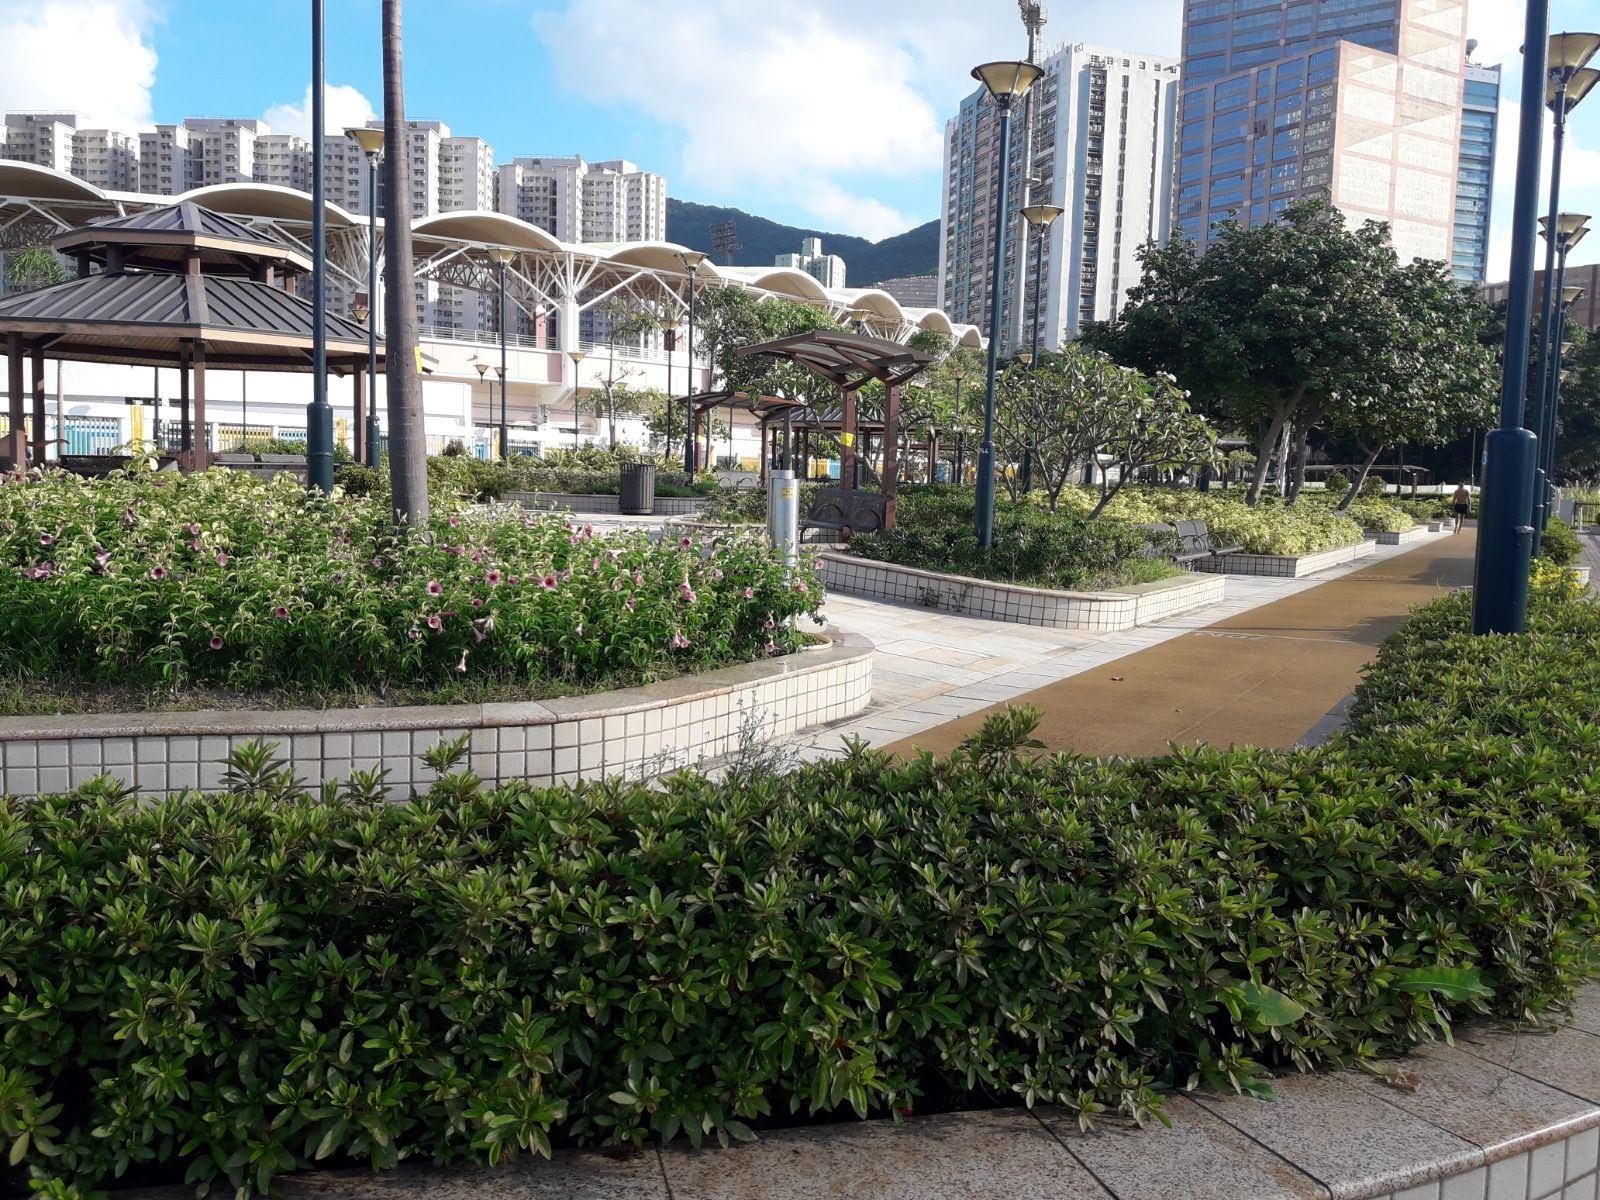 Sui Sai Wan Promenade's building structions around